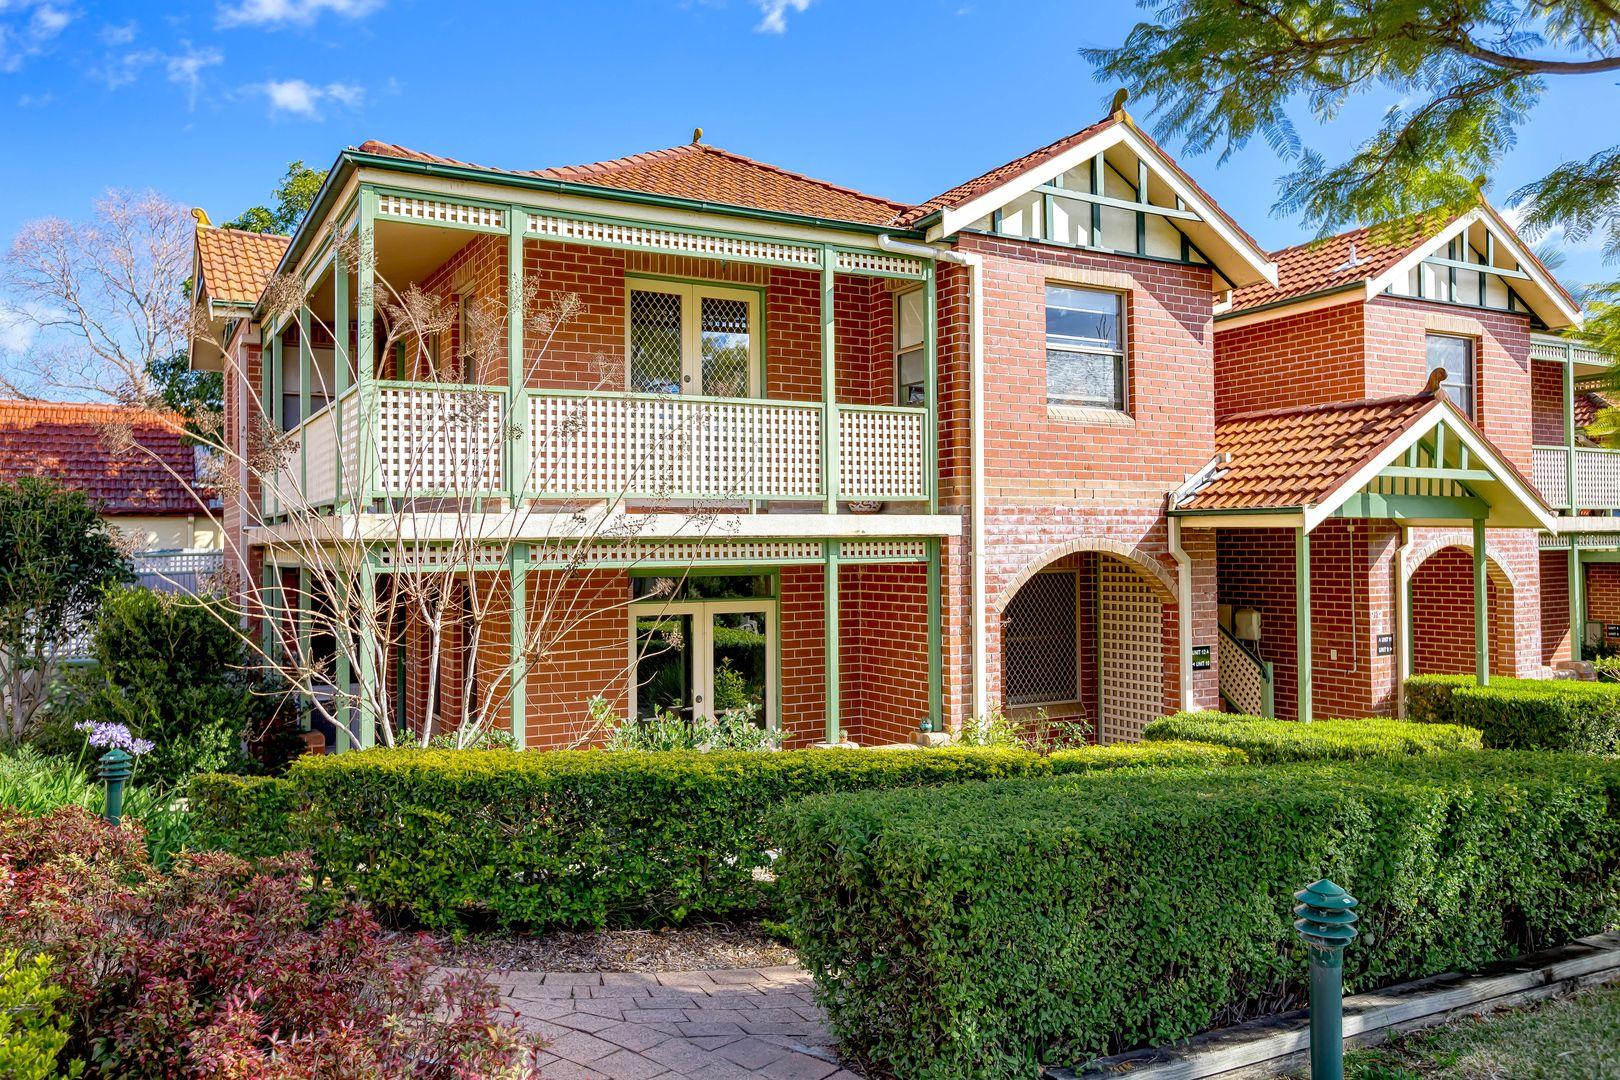 10/168-172 Albert Road, Strathfield NSW 2135, Image 0